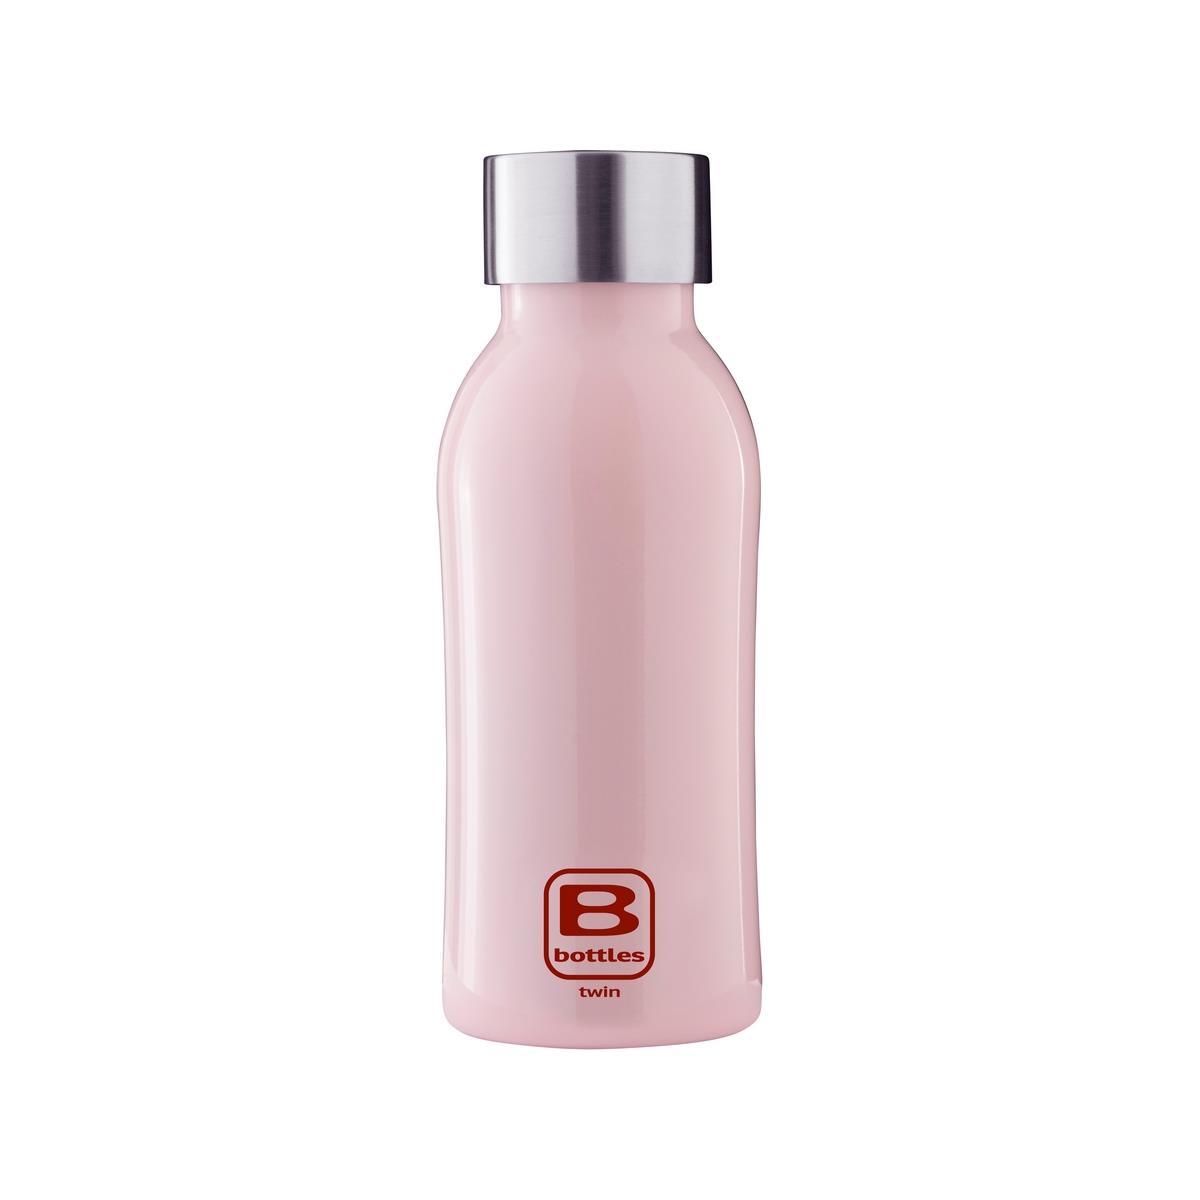 B Bottles Twin - Pink - 350 ml - Bottiglia Termica a doppia parete in acciaio inox 18/10